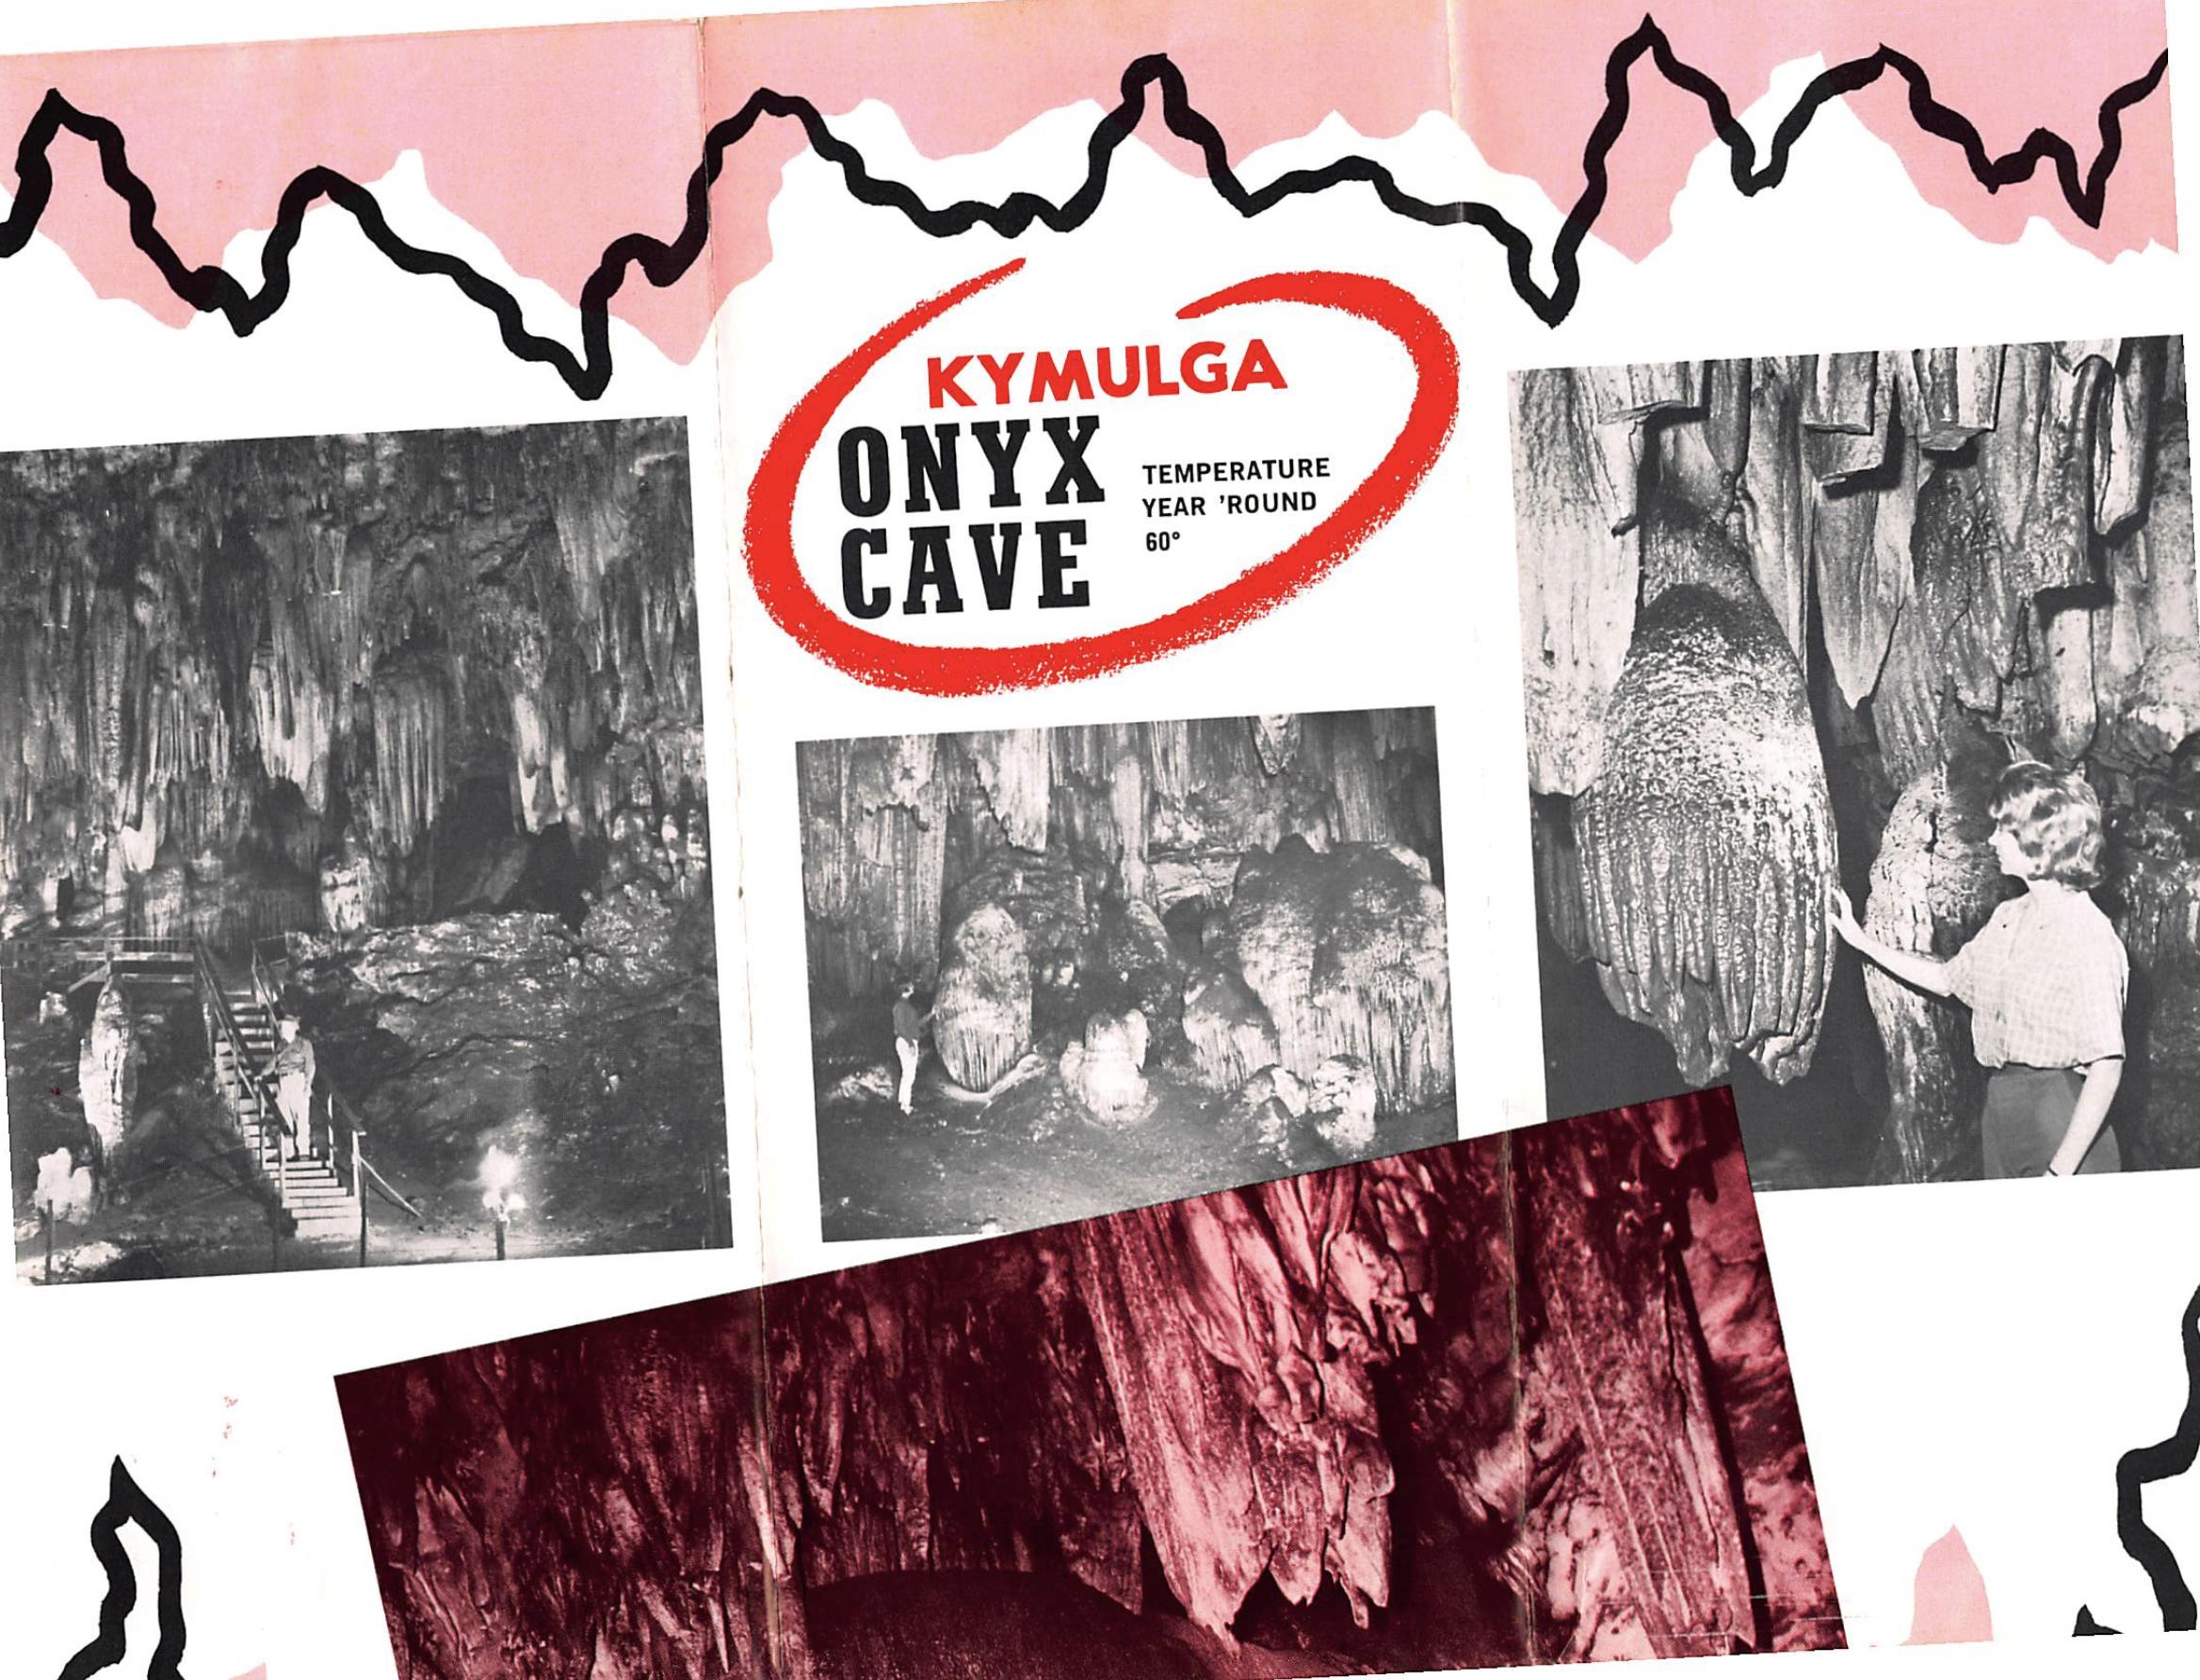 Kymulga Onyx Cave 1965 Brochure copy.jpg